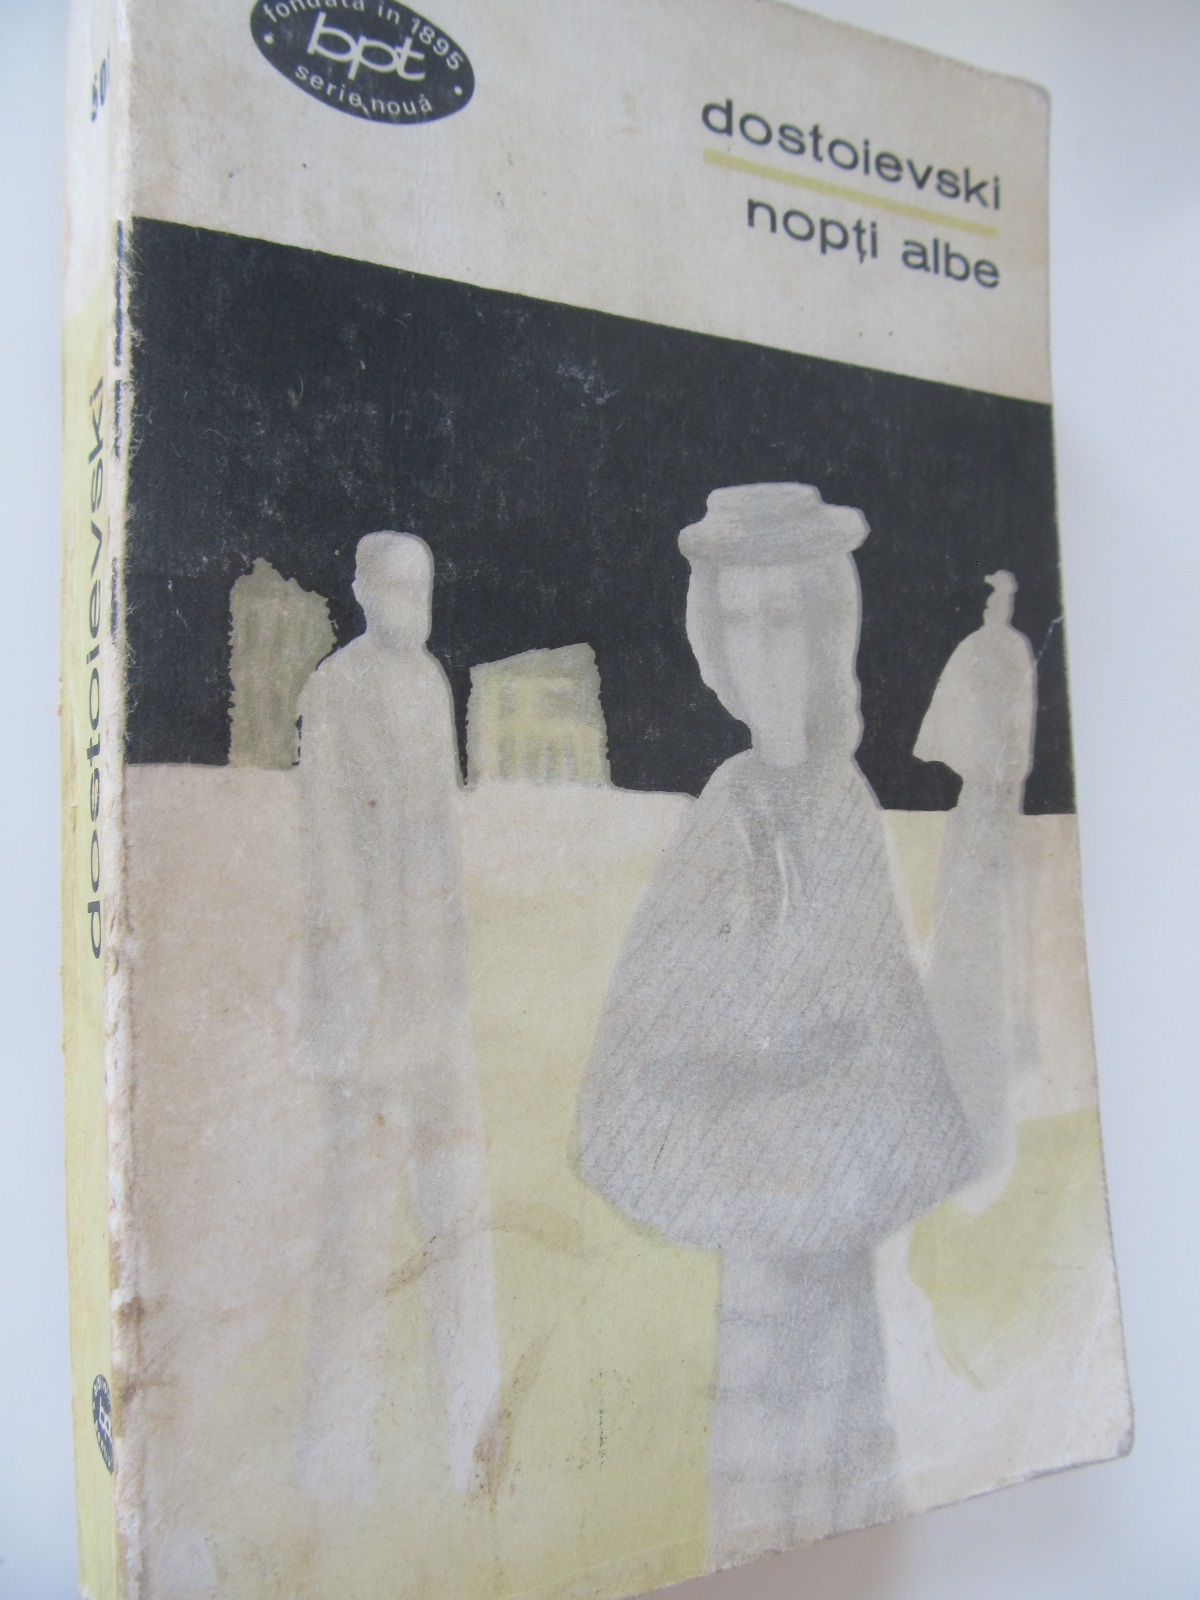 Nopti albe - Dostoievski | Detalii carte